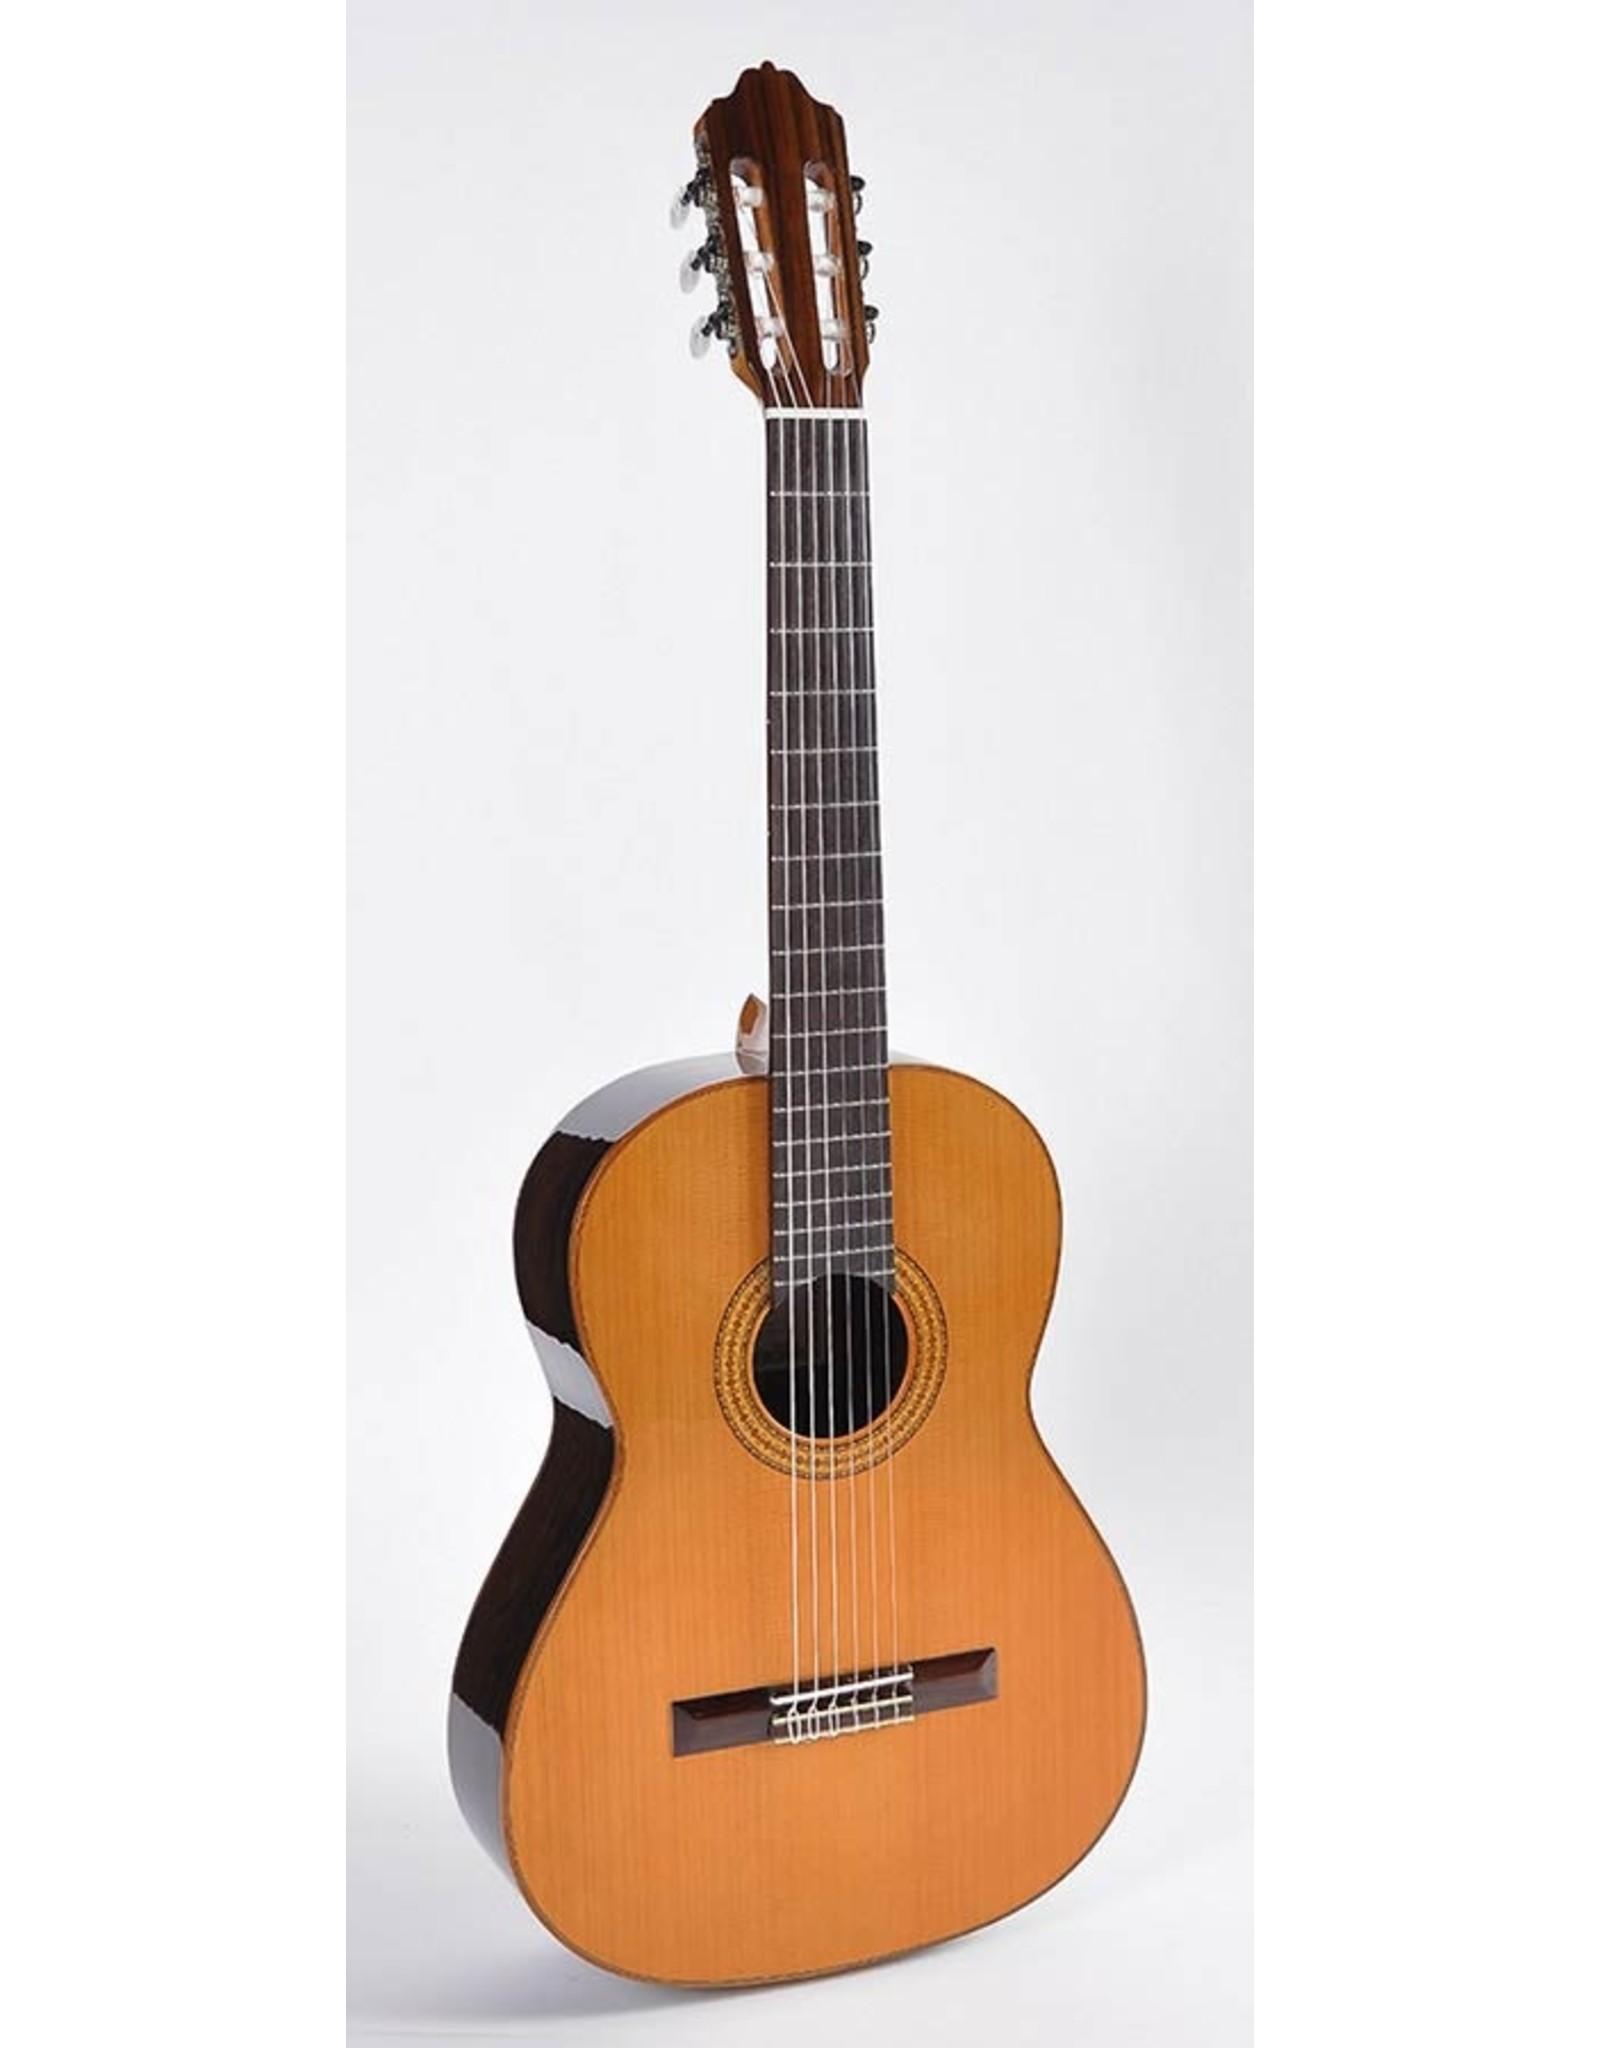 Esteve Esteve 3Z-CD Classic Series klassieke gitaar